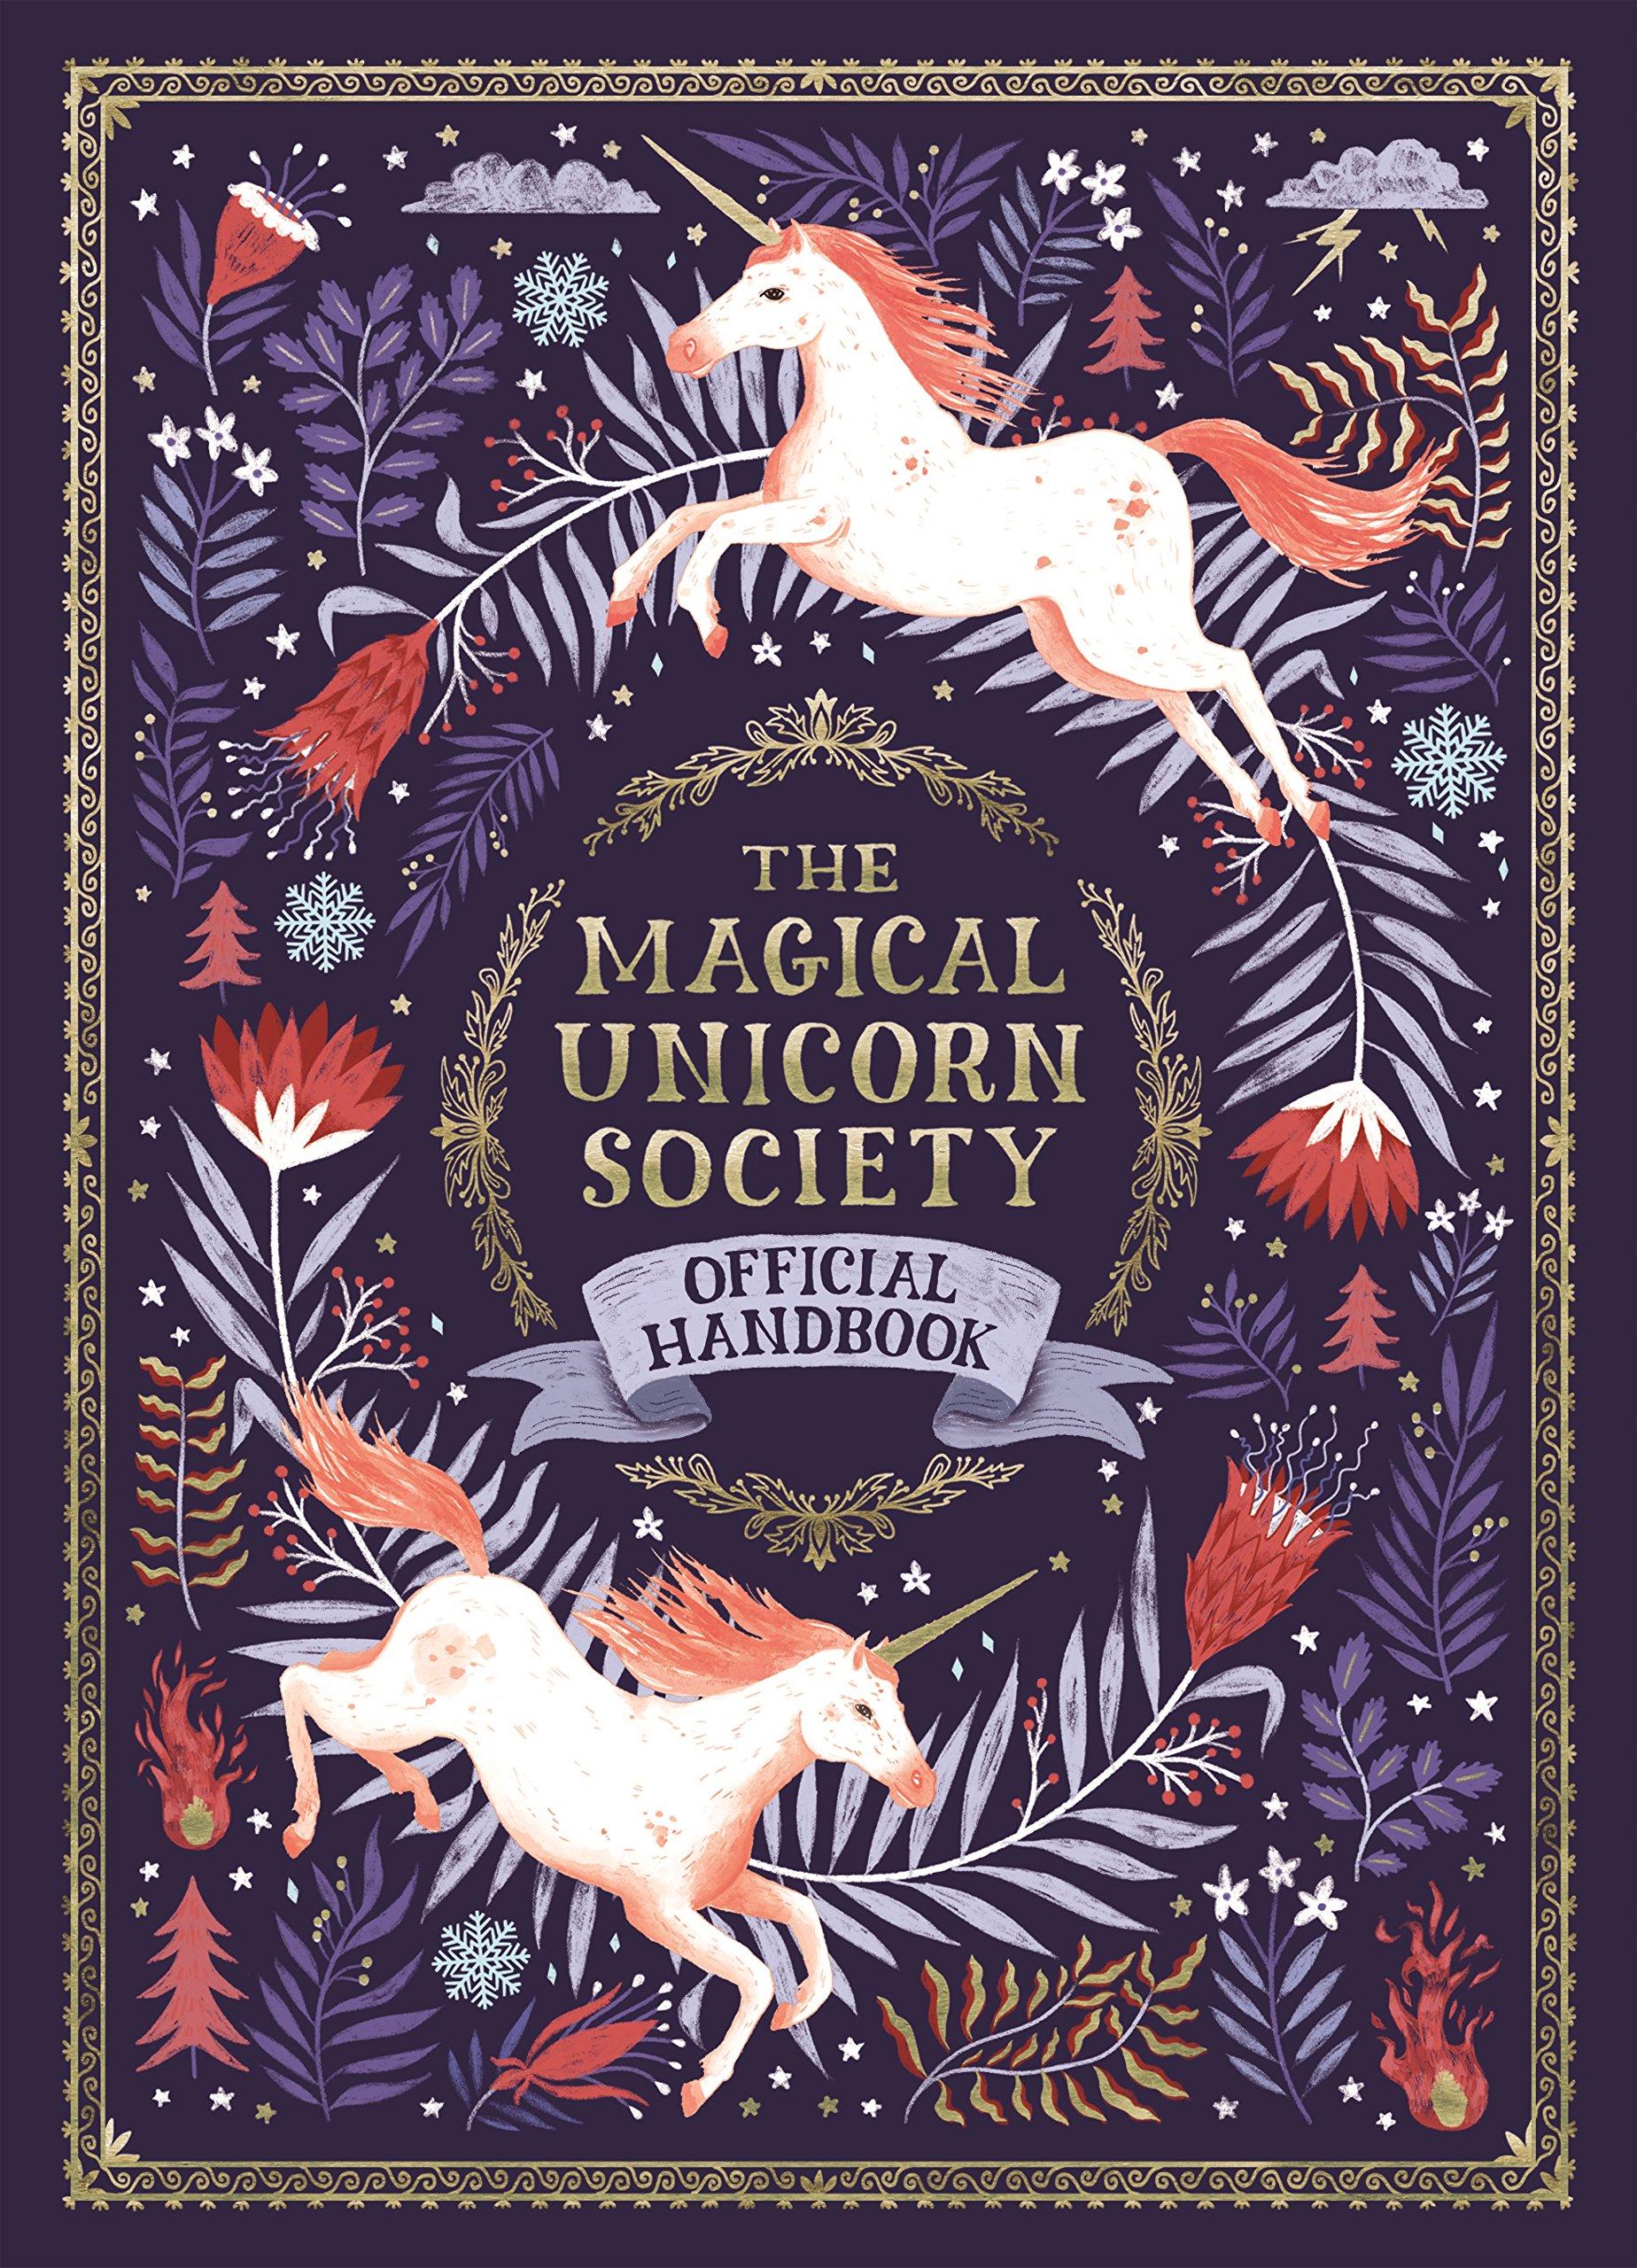 The Magical Unicorn Society Official Handbook 3